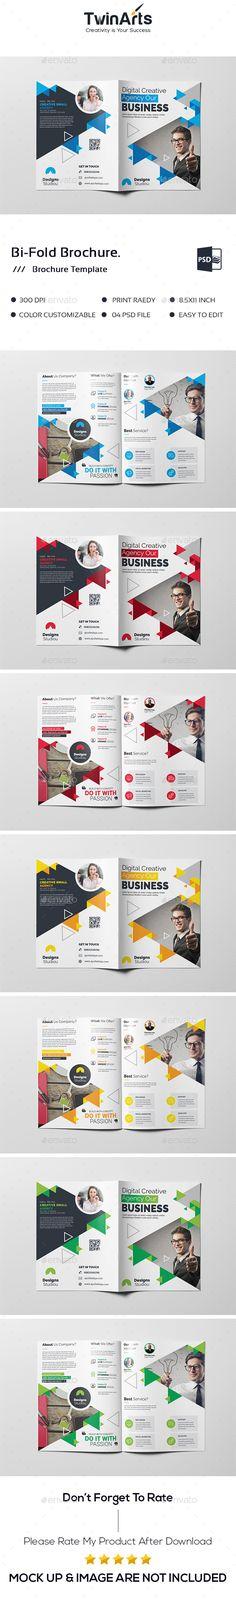 Bi-Fold Brochure. - Brochures Print Templates